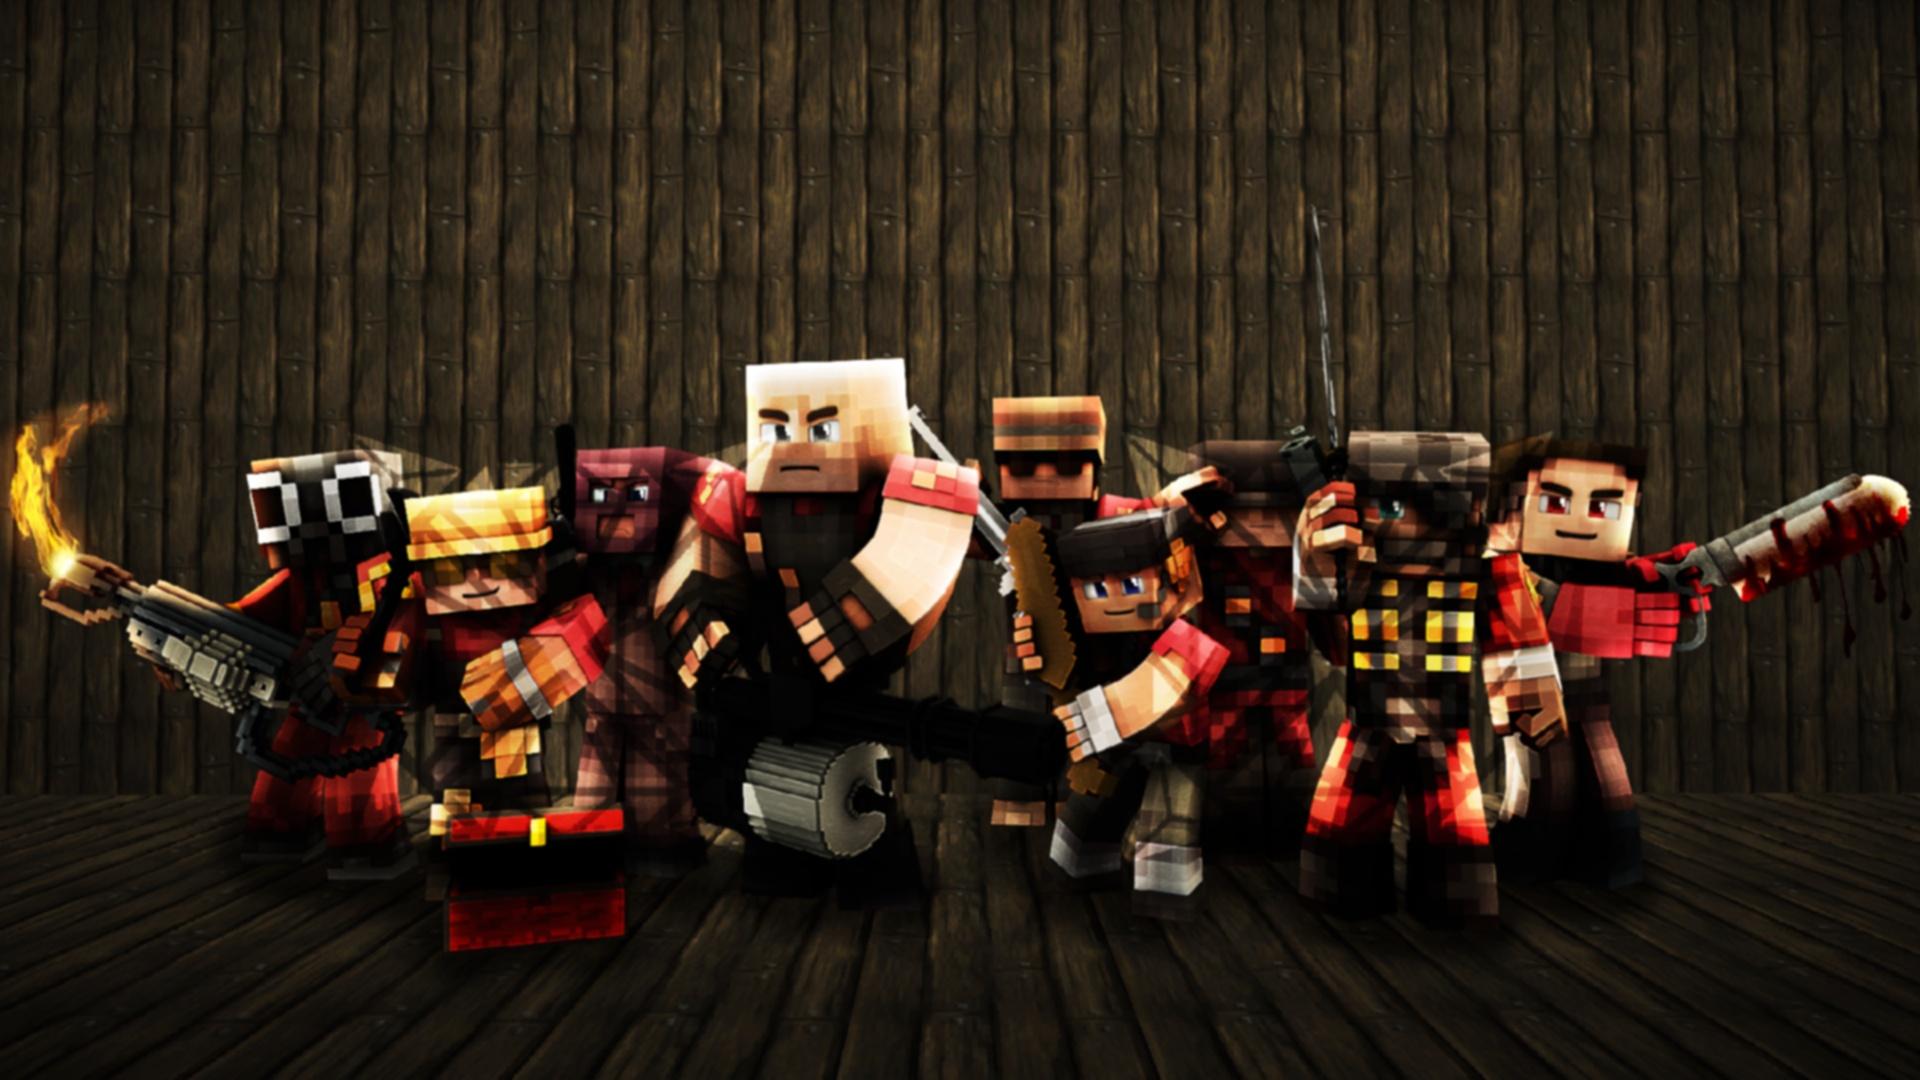 Team Fortress 2 Minecraft Wallpaper